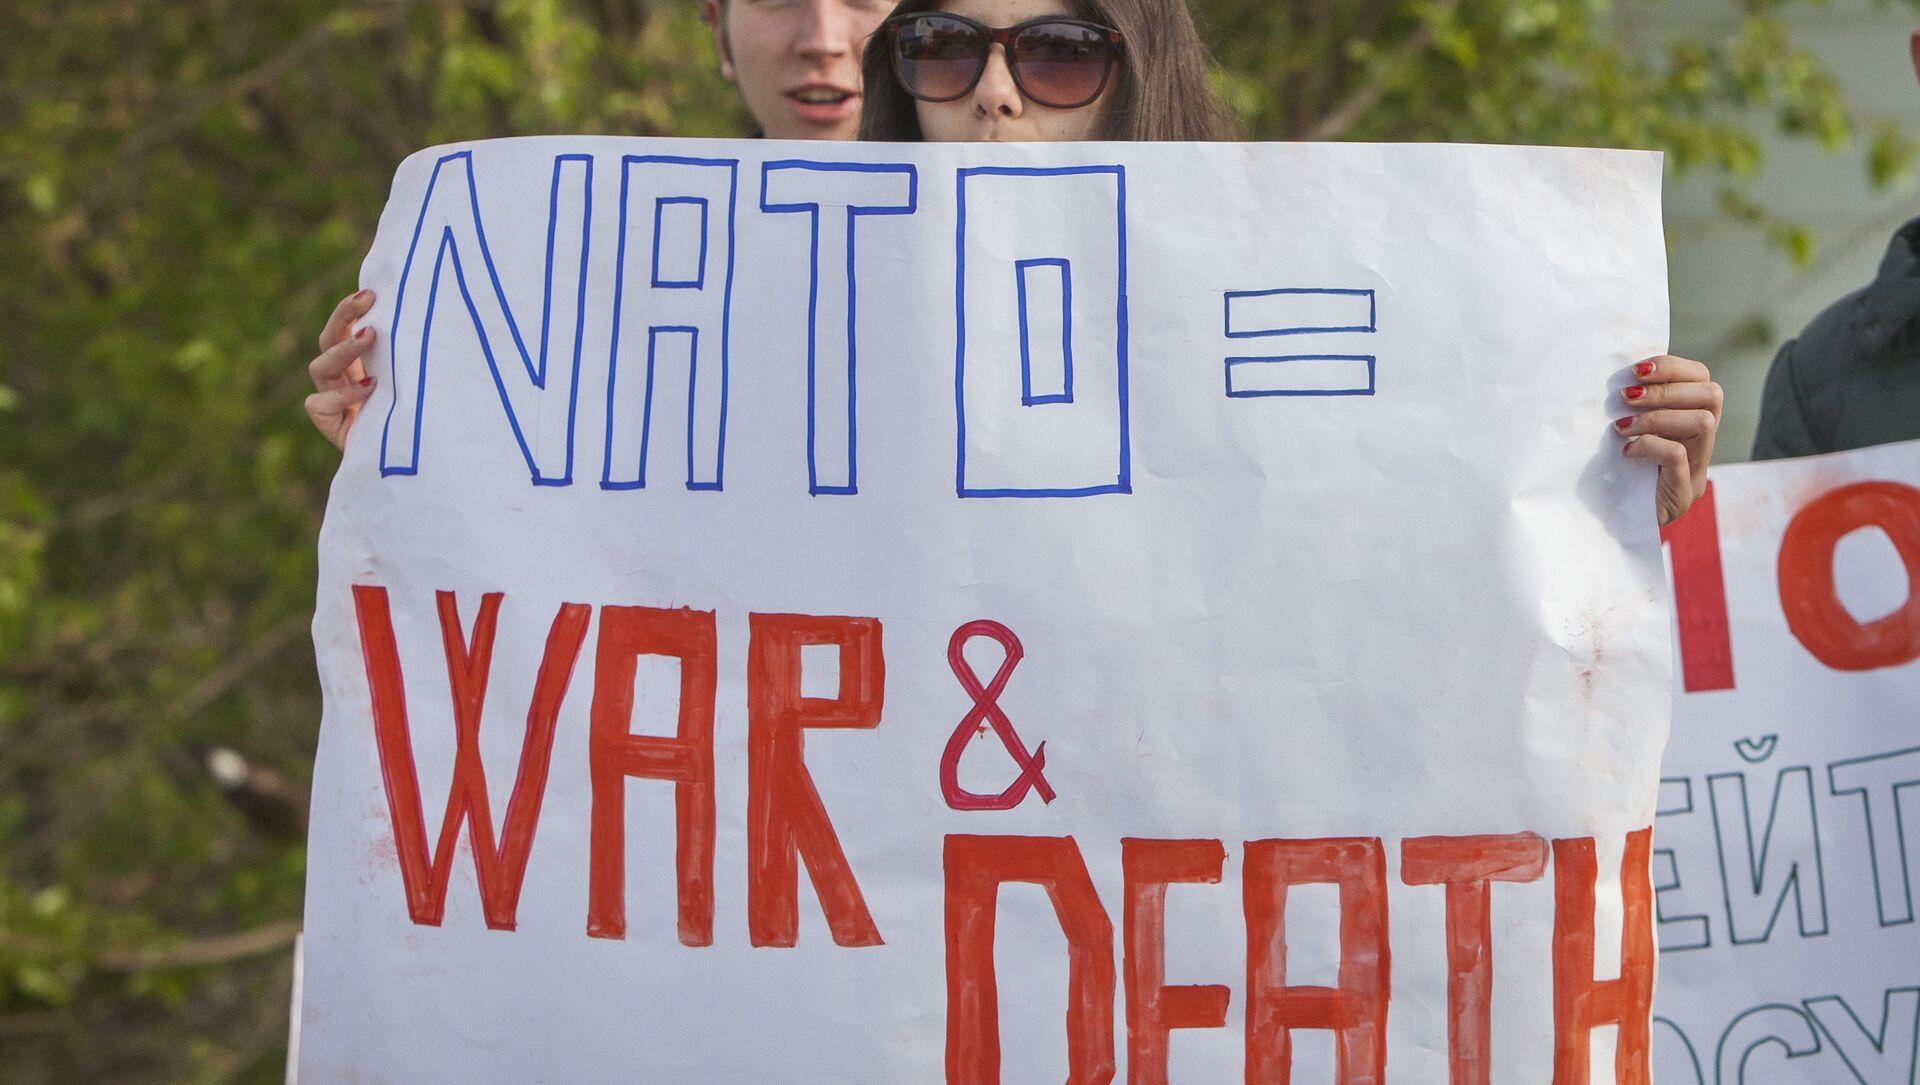 Manifestanti in Moldavia anti-NATO e anti-USA - Sputnik Italia, 1920, 27.04.2021